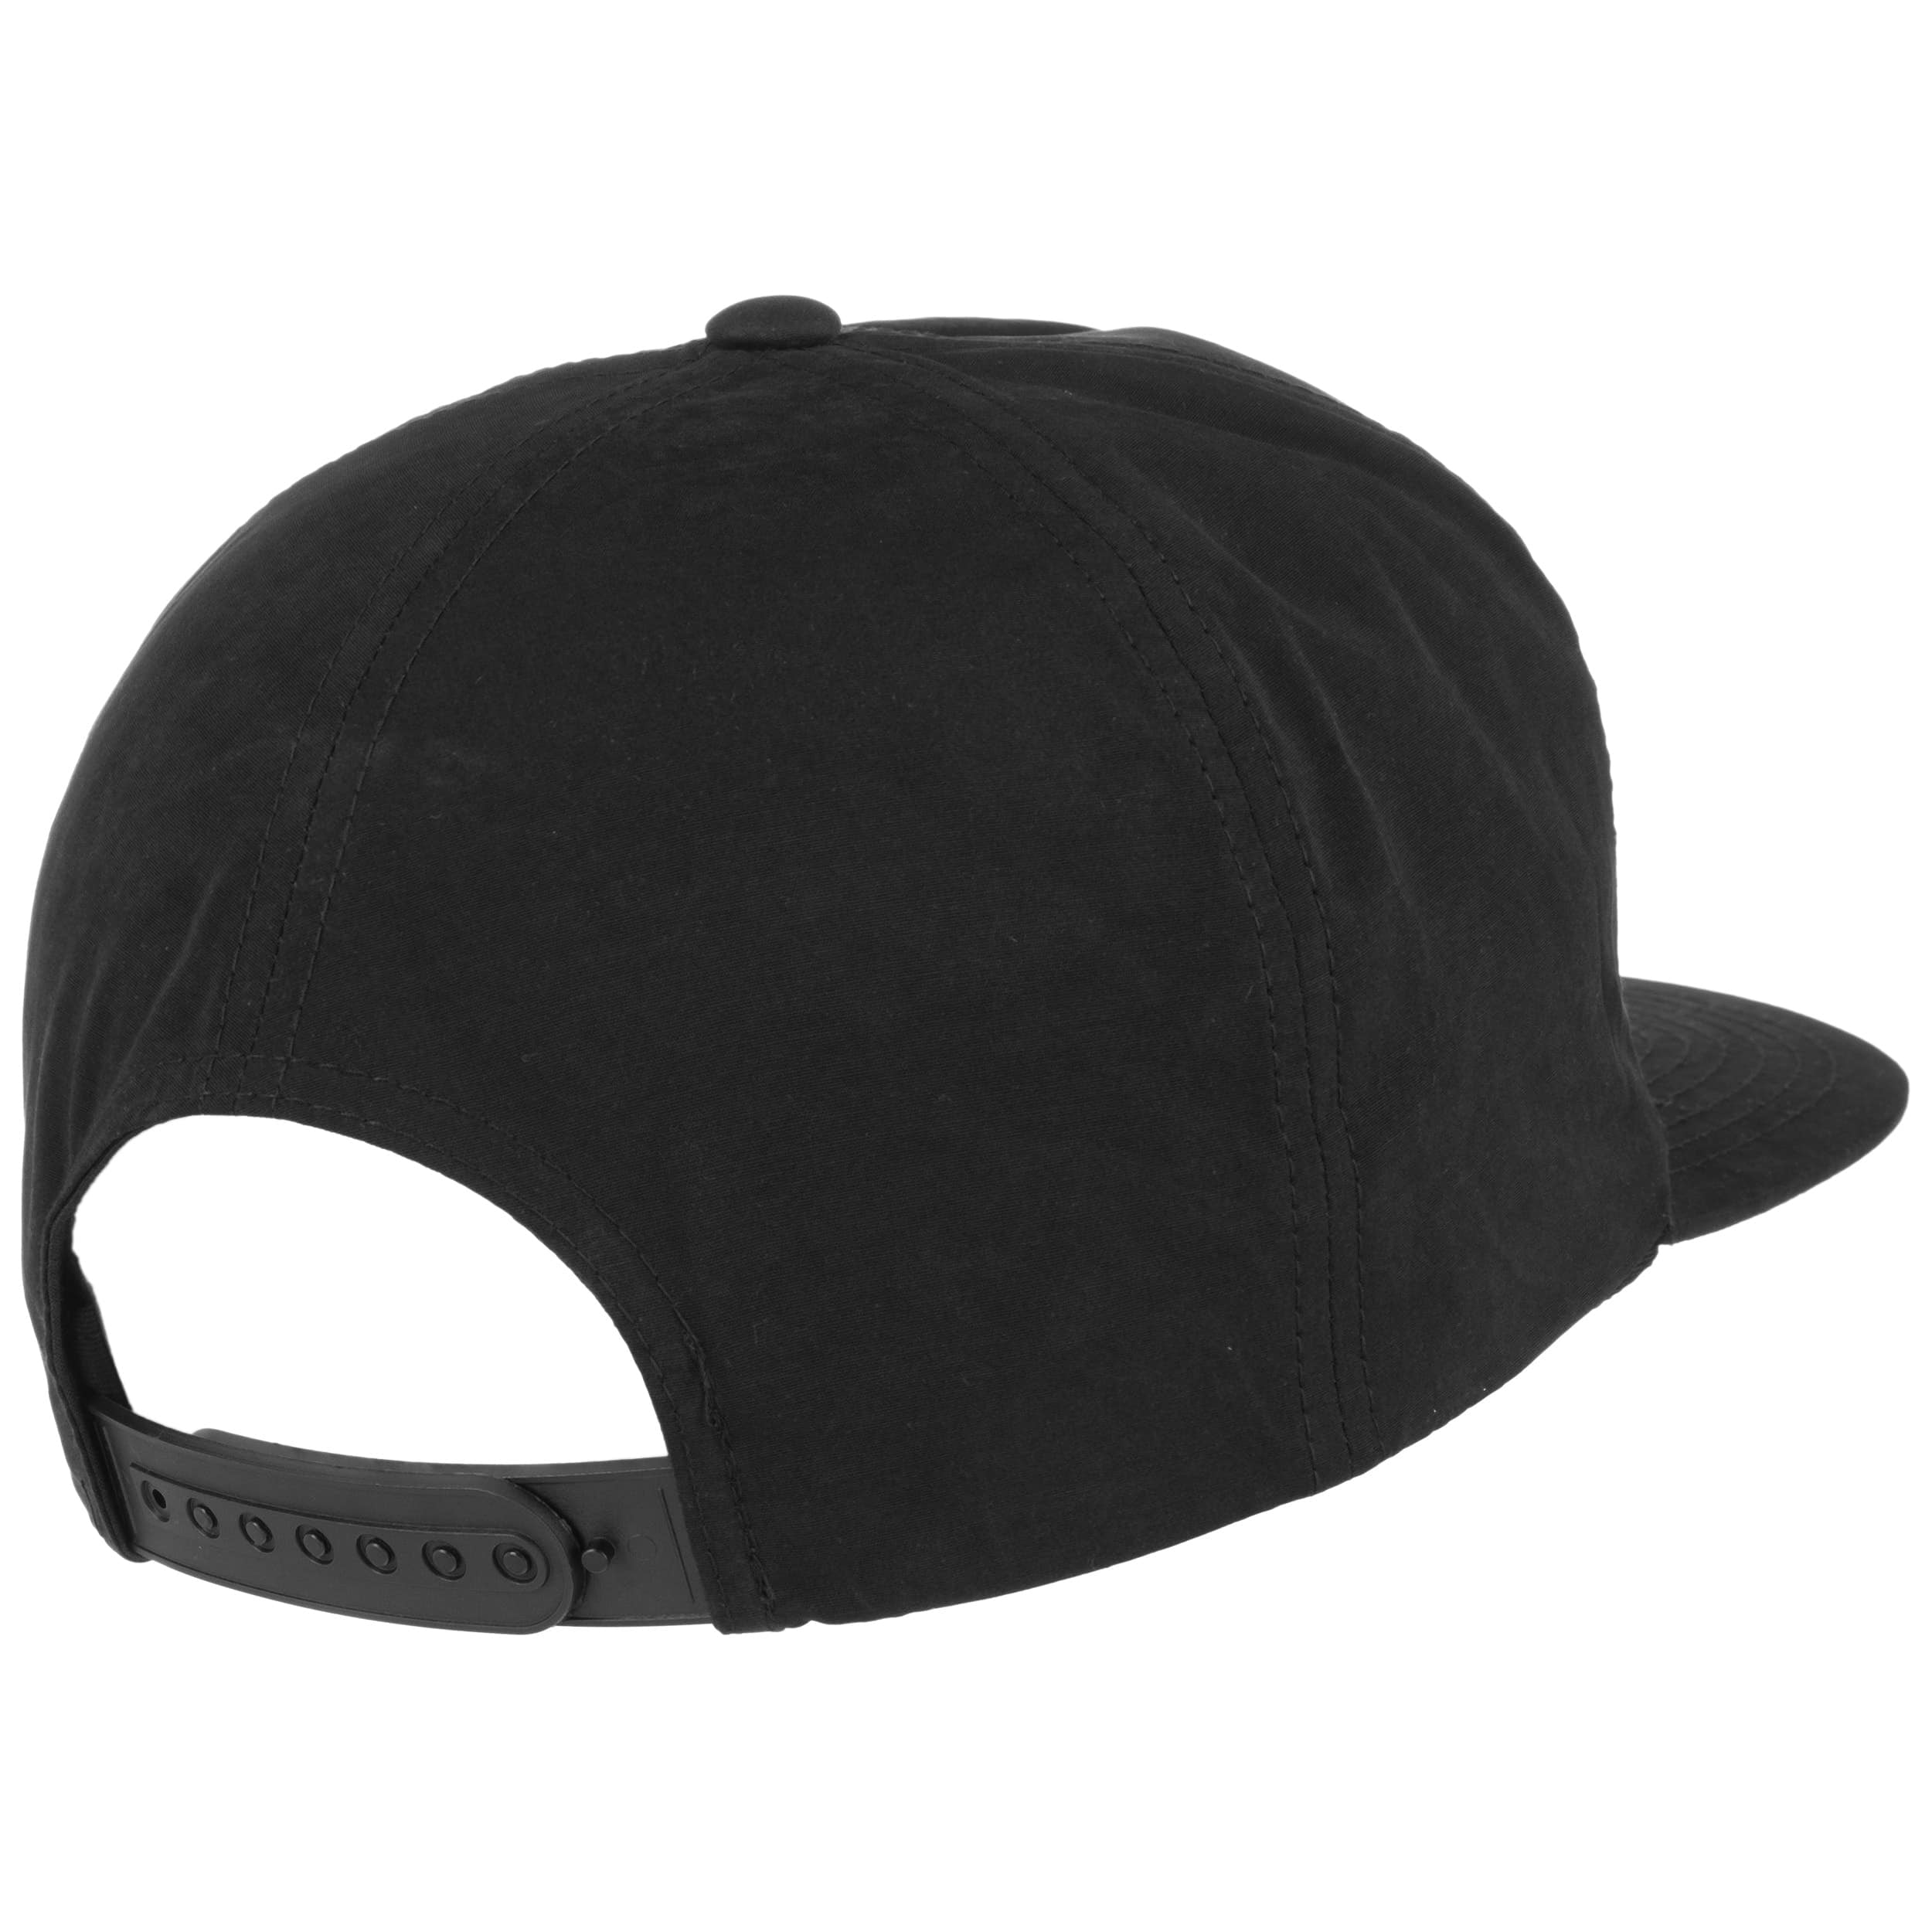 promo code 09ea4 89976 ... best eagle snapback cap by volcom black 3 99b25 78e4a